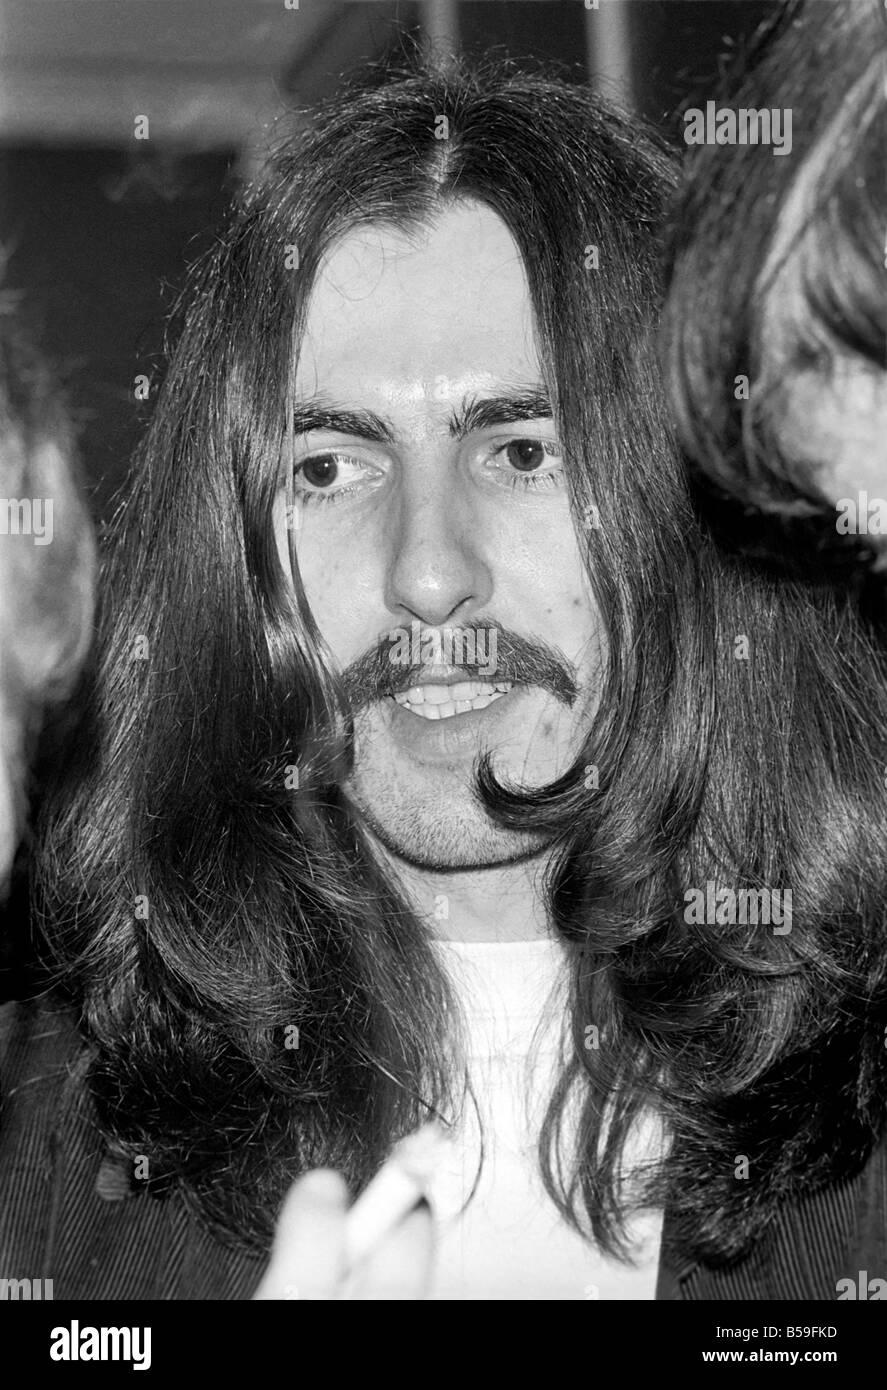 Beatles singer George Harrison. December 1969 Z11673-006 - Stock Image